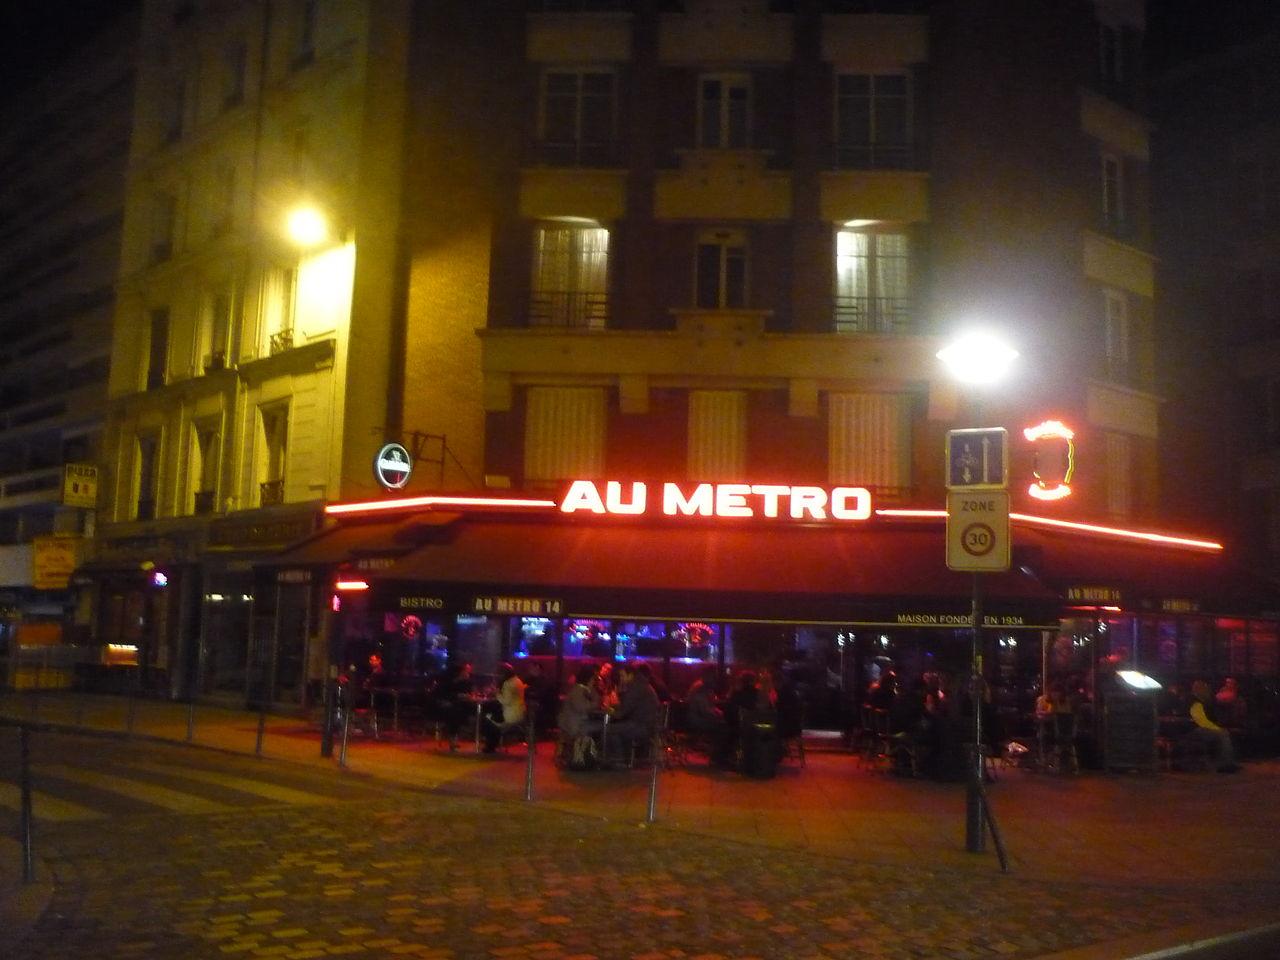 Losserand Caf Ef Bf Bd  Rue Raymond Losserand  Paris